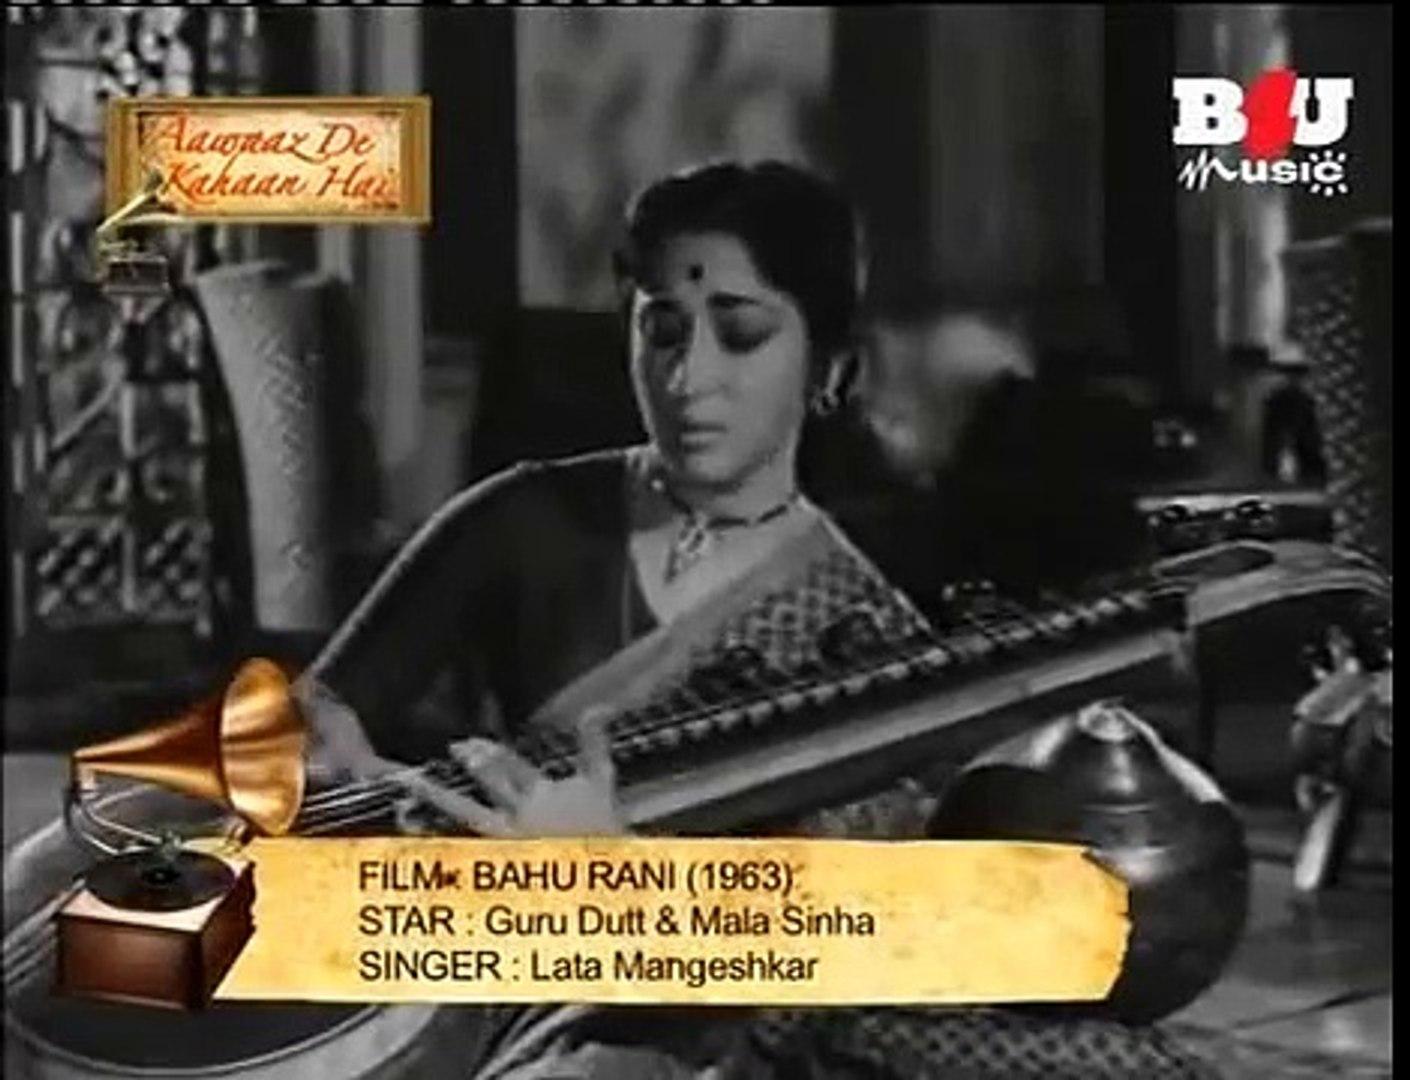 bahurani 1963 songs